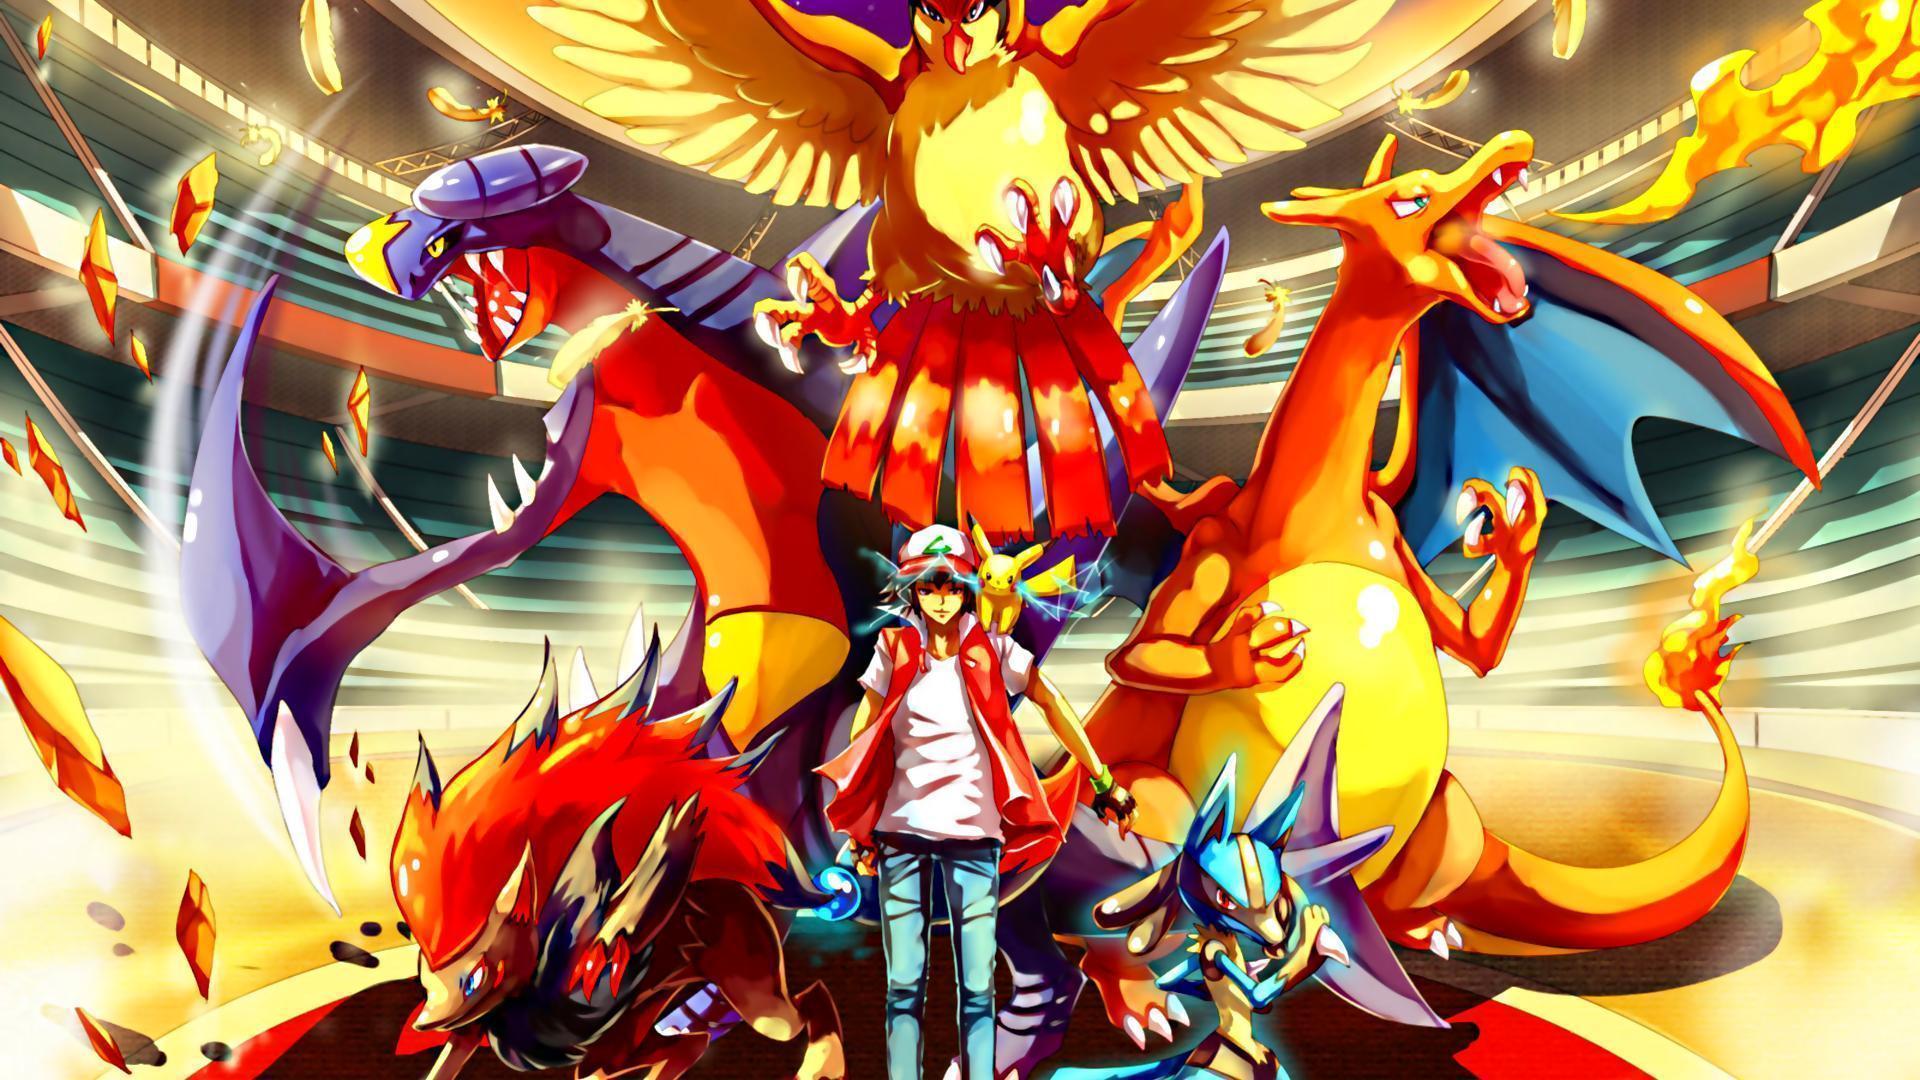 Best 59 Pokemon Wallpaper on HipWallpaper Awesome Pokemon 1920x1080